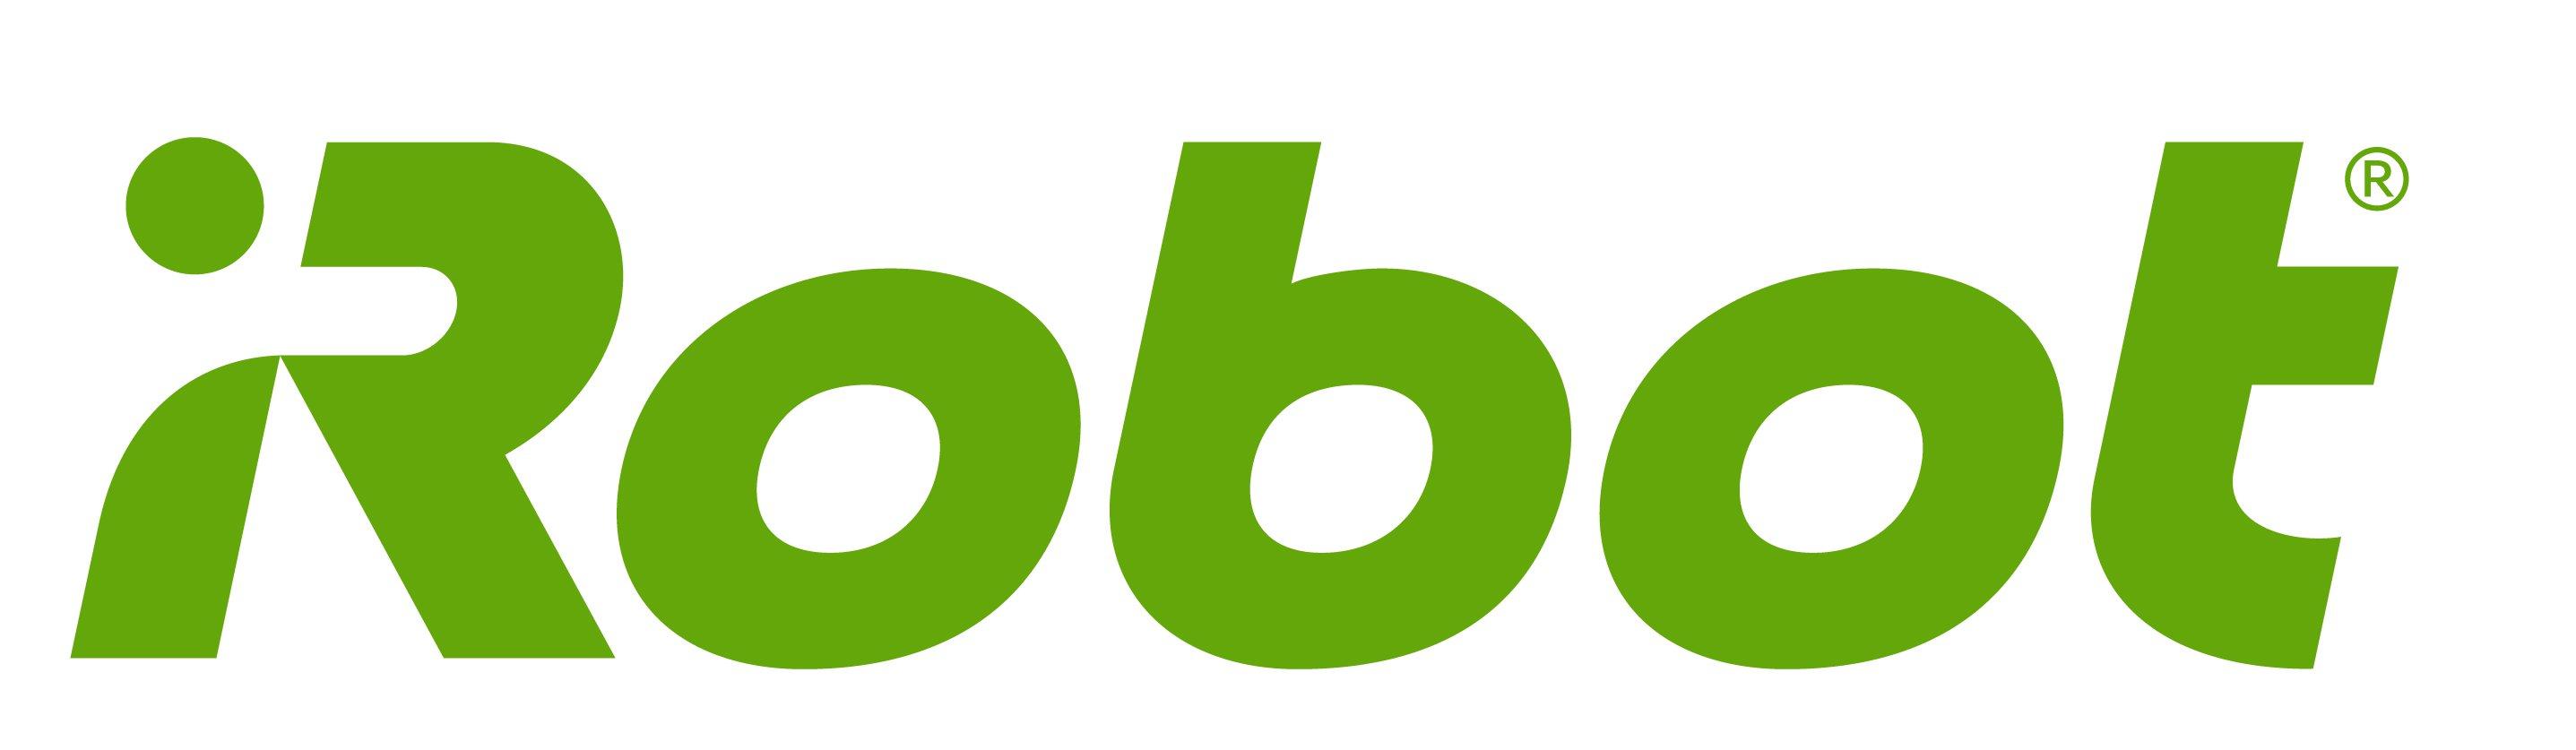 Irobot Corp